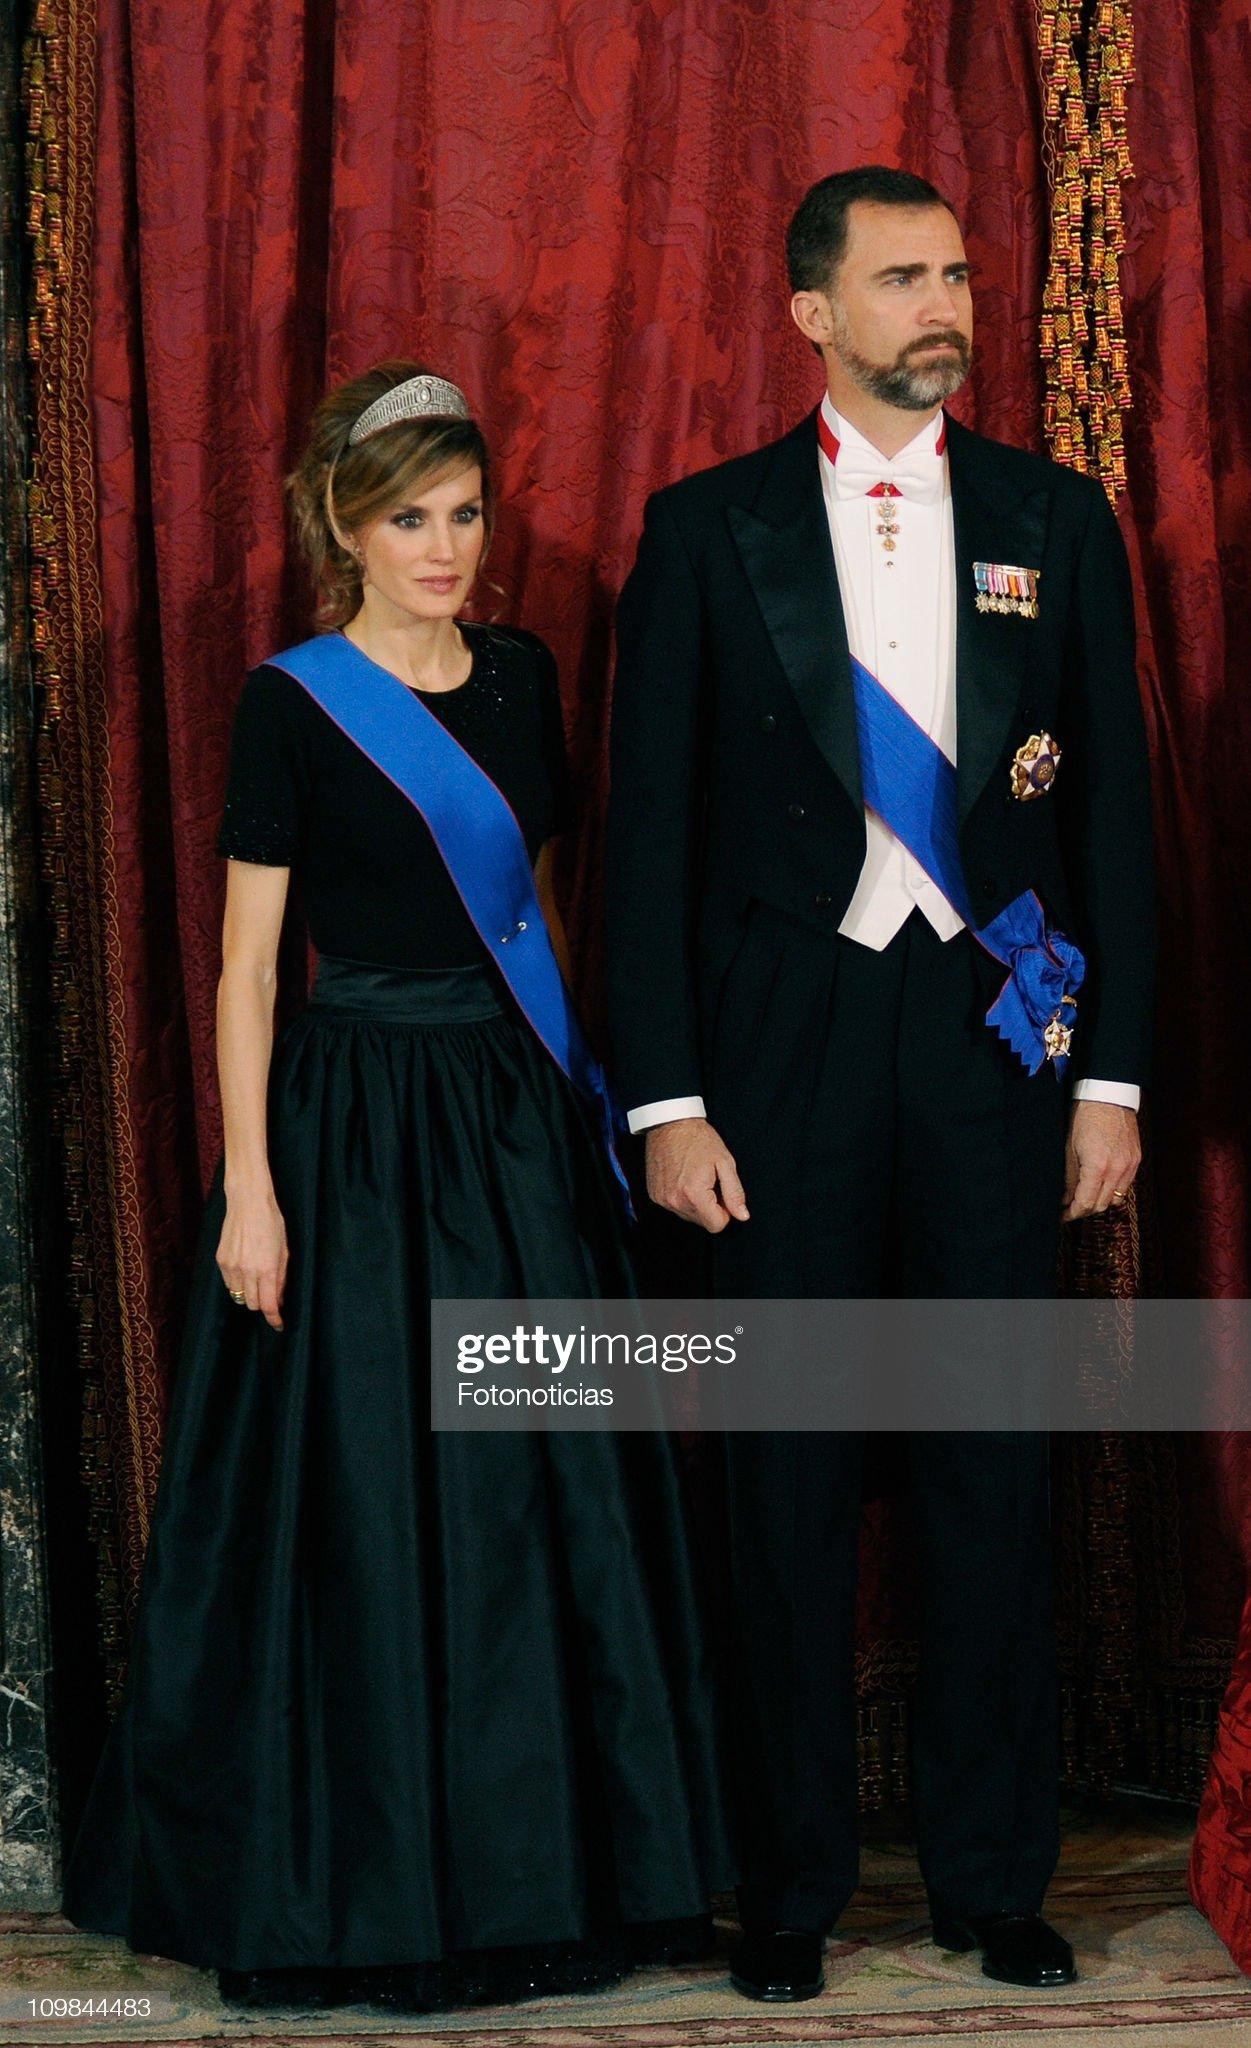 Вечерние наряды Королевы Летиции Spanish Royals Receive President of Chile - Gala Dinner : News Photo